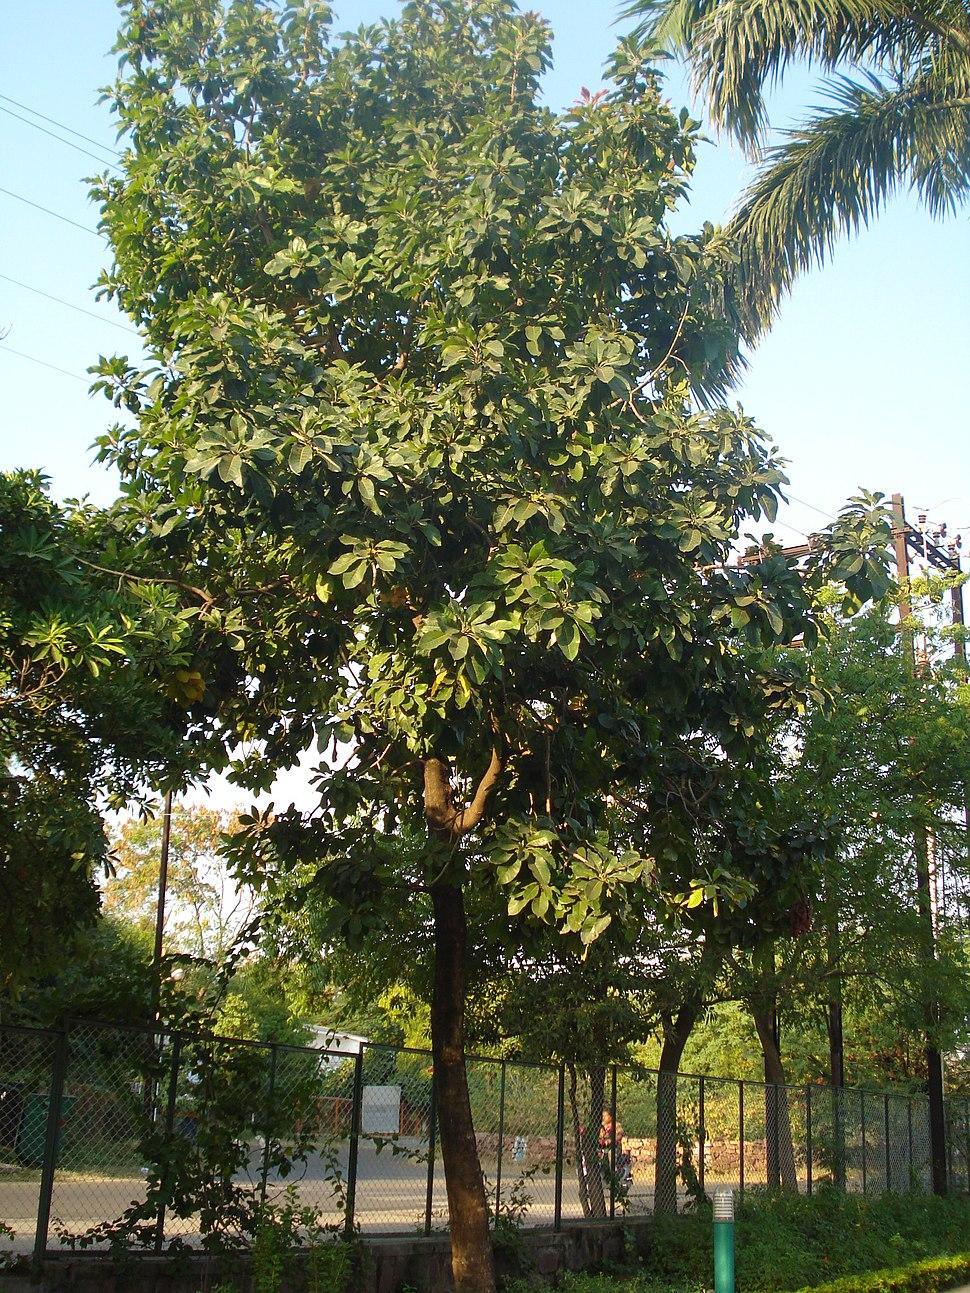 Terminalia belerica Bhopal